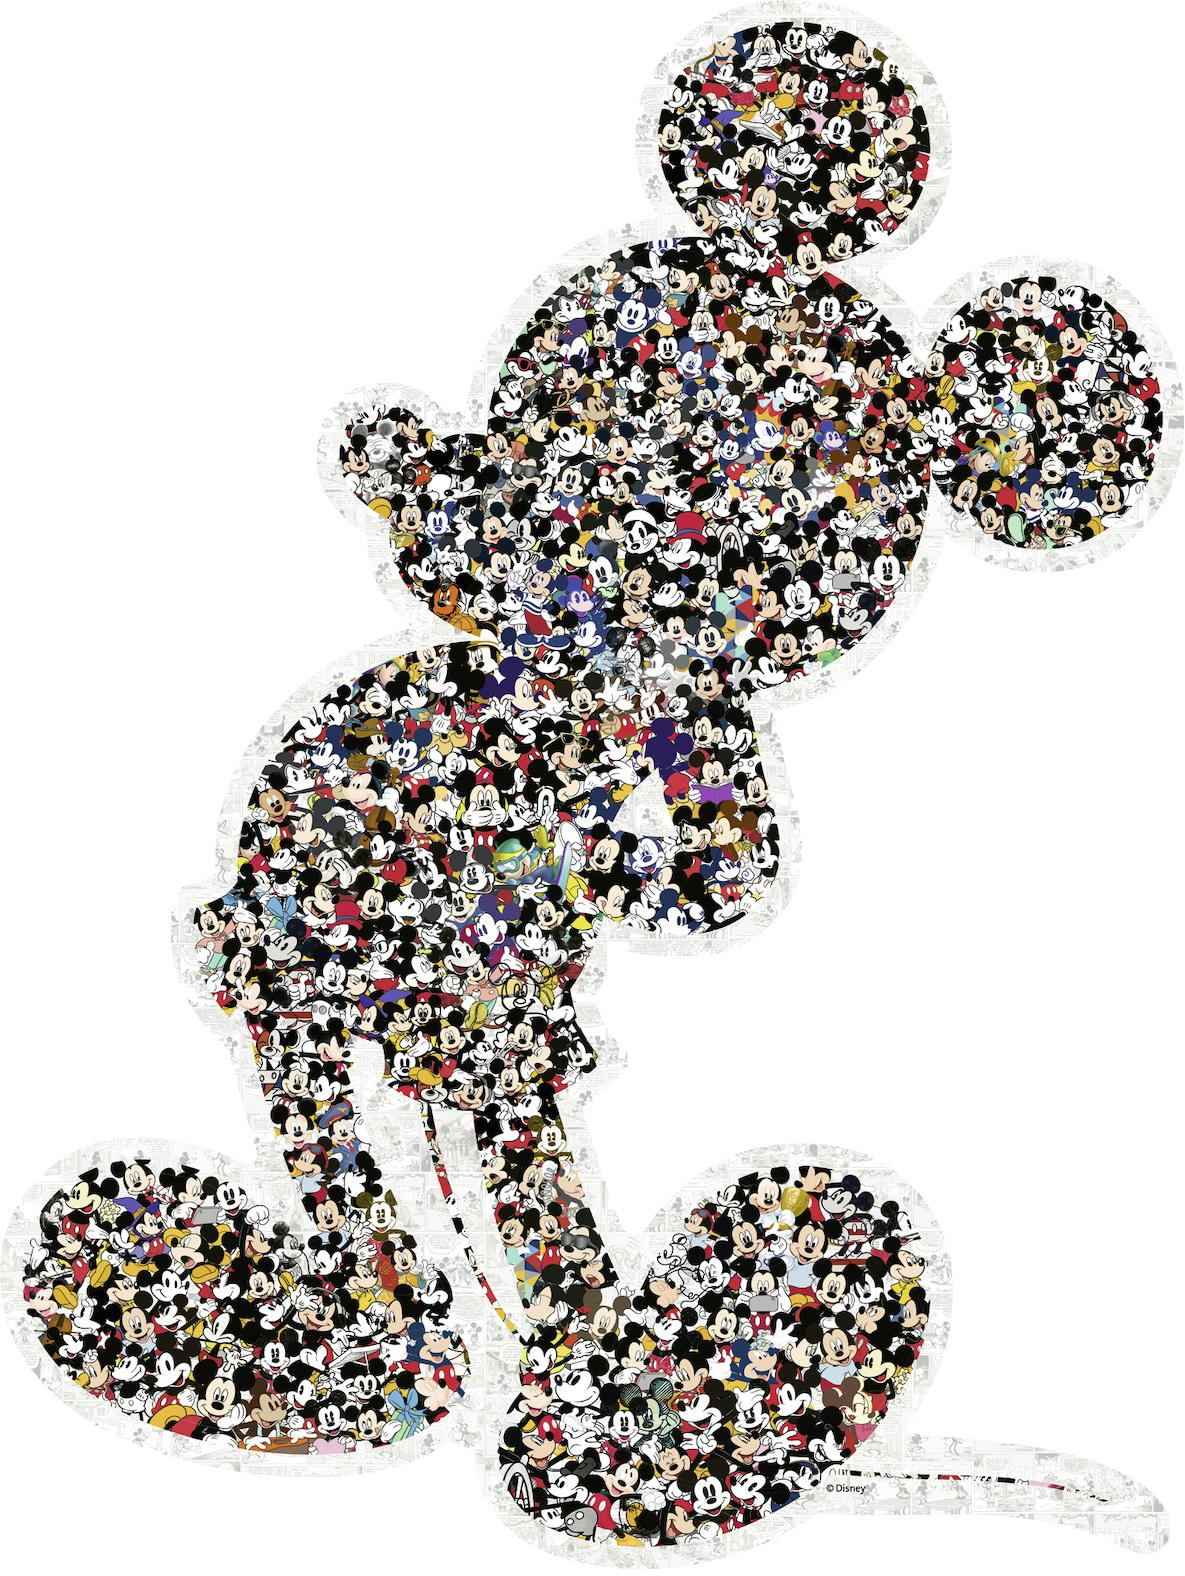 Ravensburger Konturenpuzzle Shaped Mickey, Made in Germany bunt Kinder Ab 12-15 Jahren Altersempfehlung Puzzles